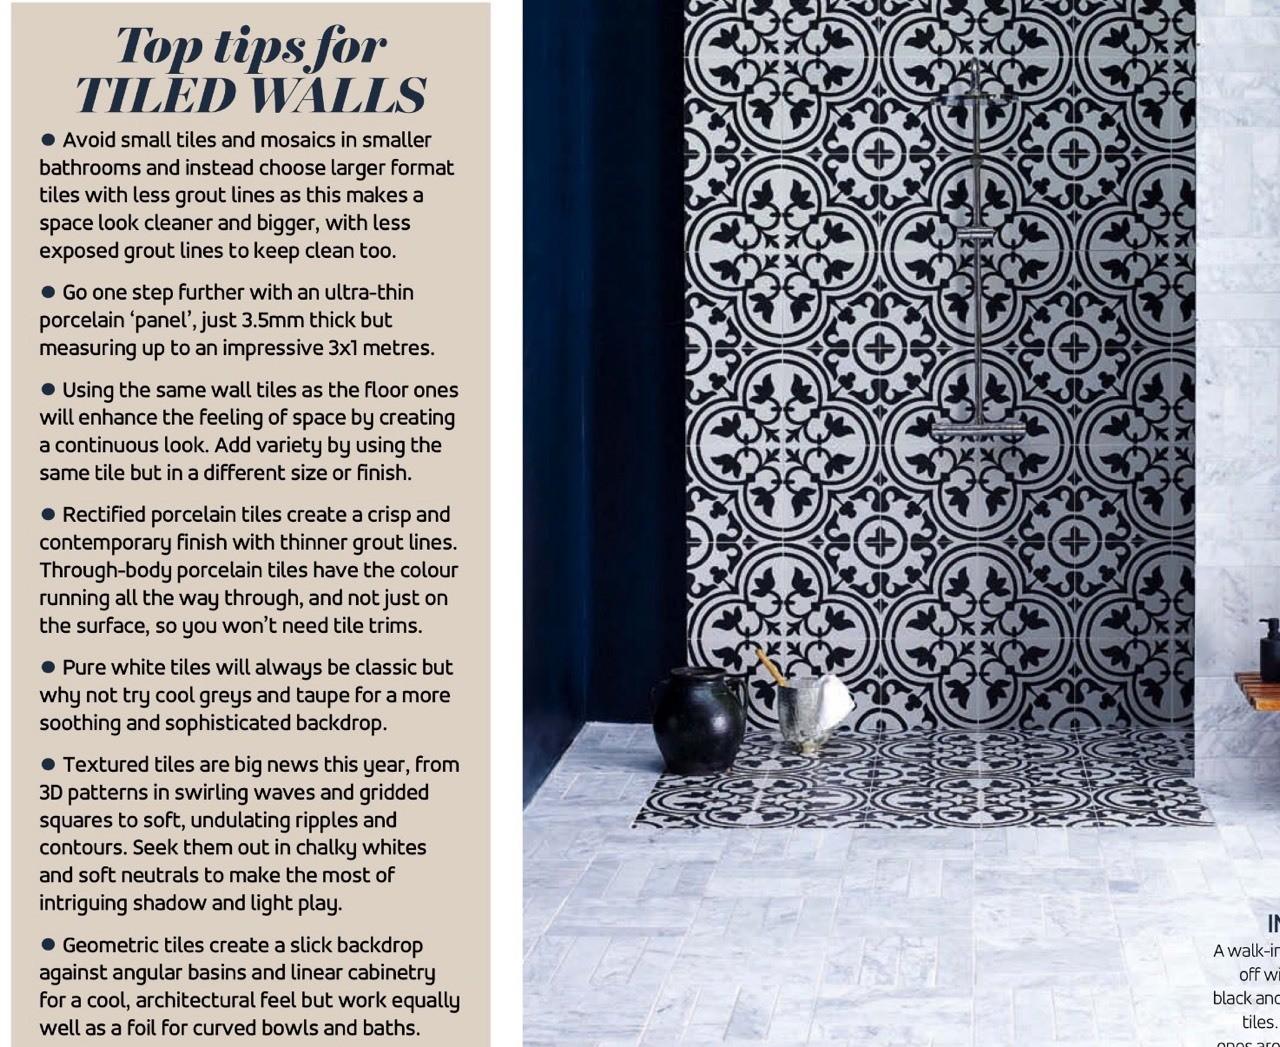 Tips for tiled walls